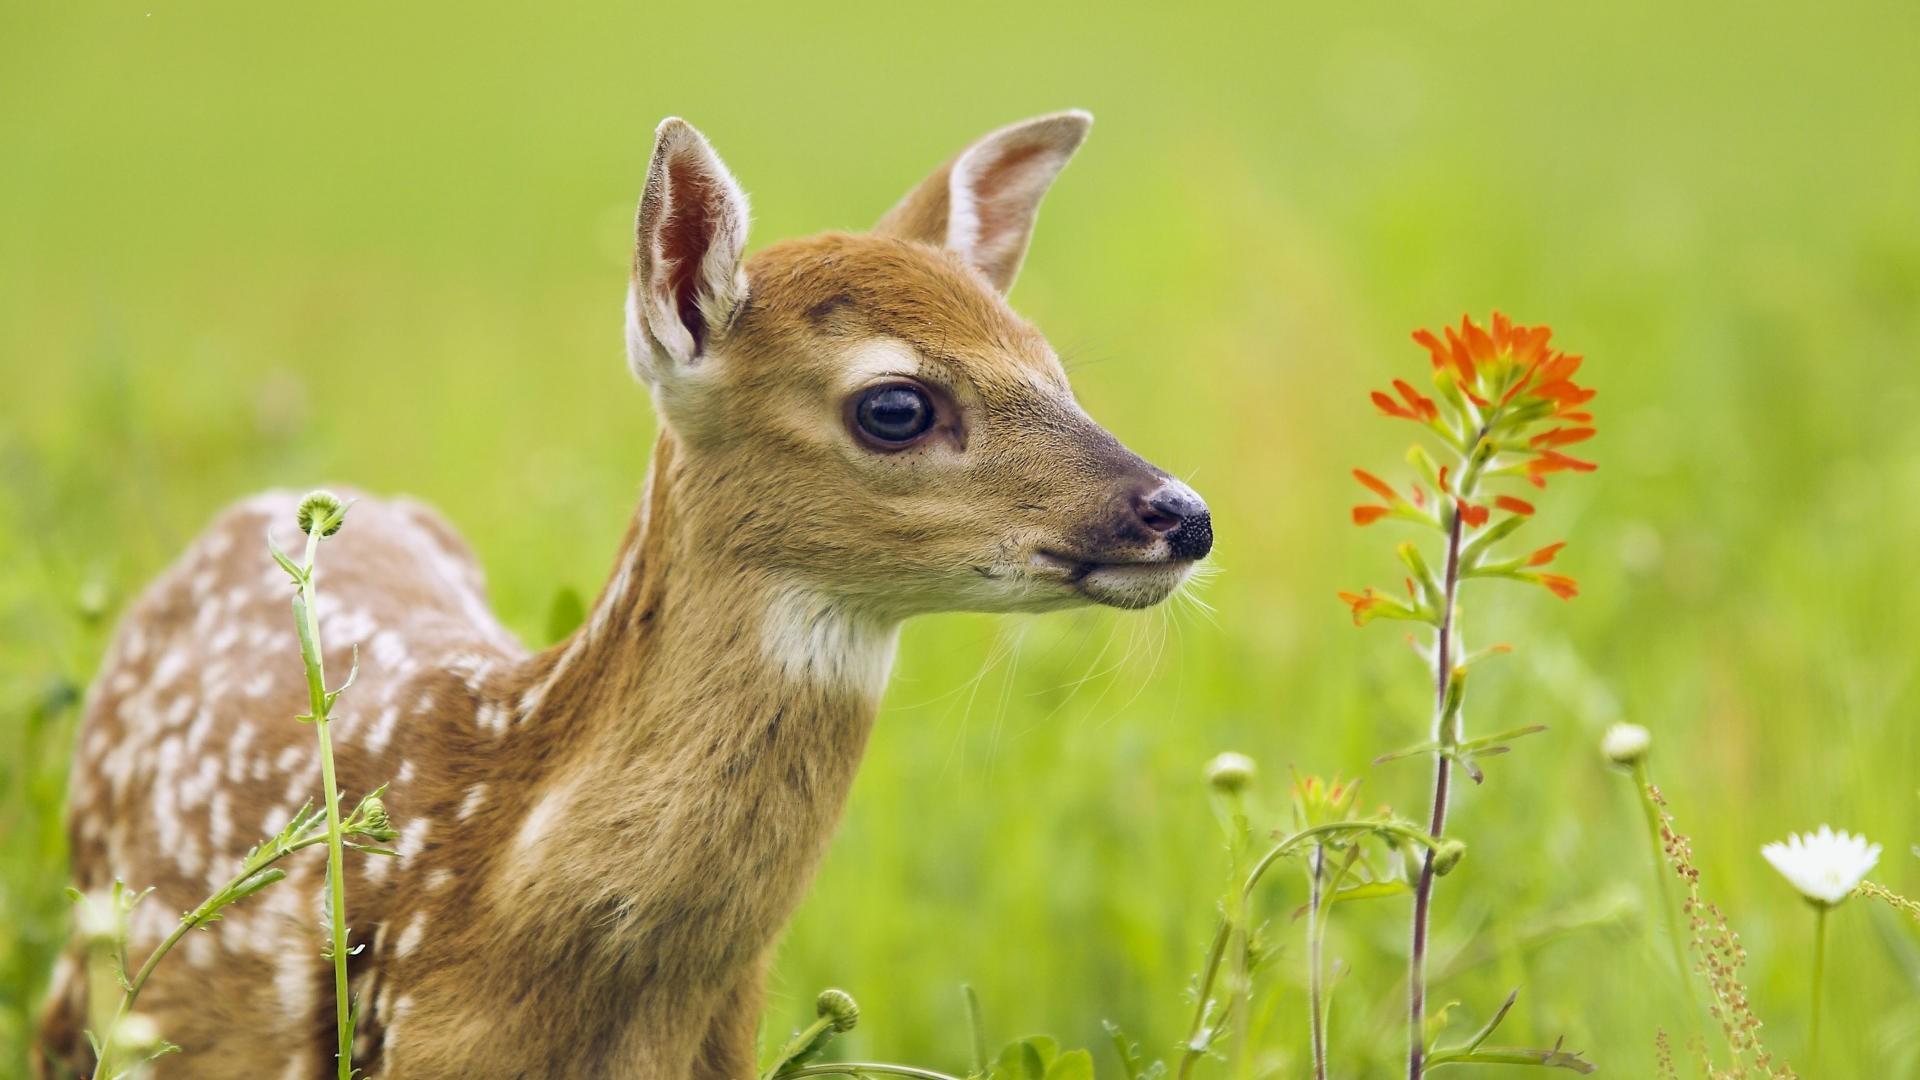 Deer Nature Animals Fawns Baby Animals Wallpapers Hd: Wallpaper : Nature, Wildlife, Baby Animals, Whiskers